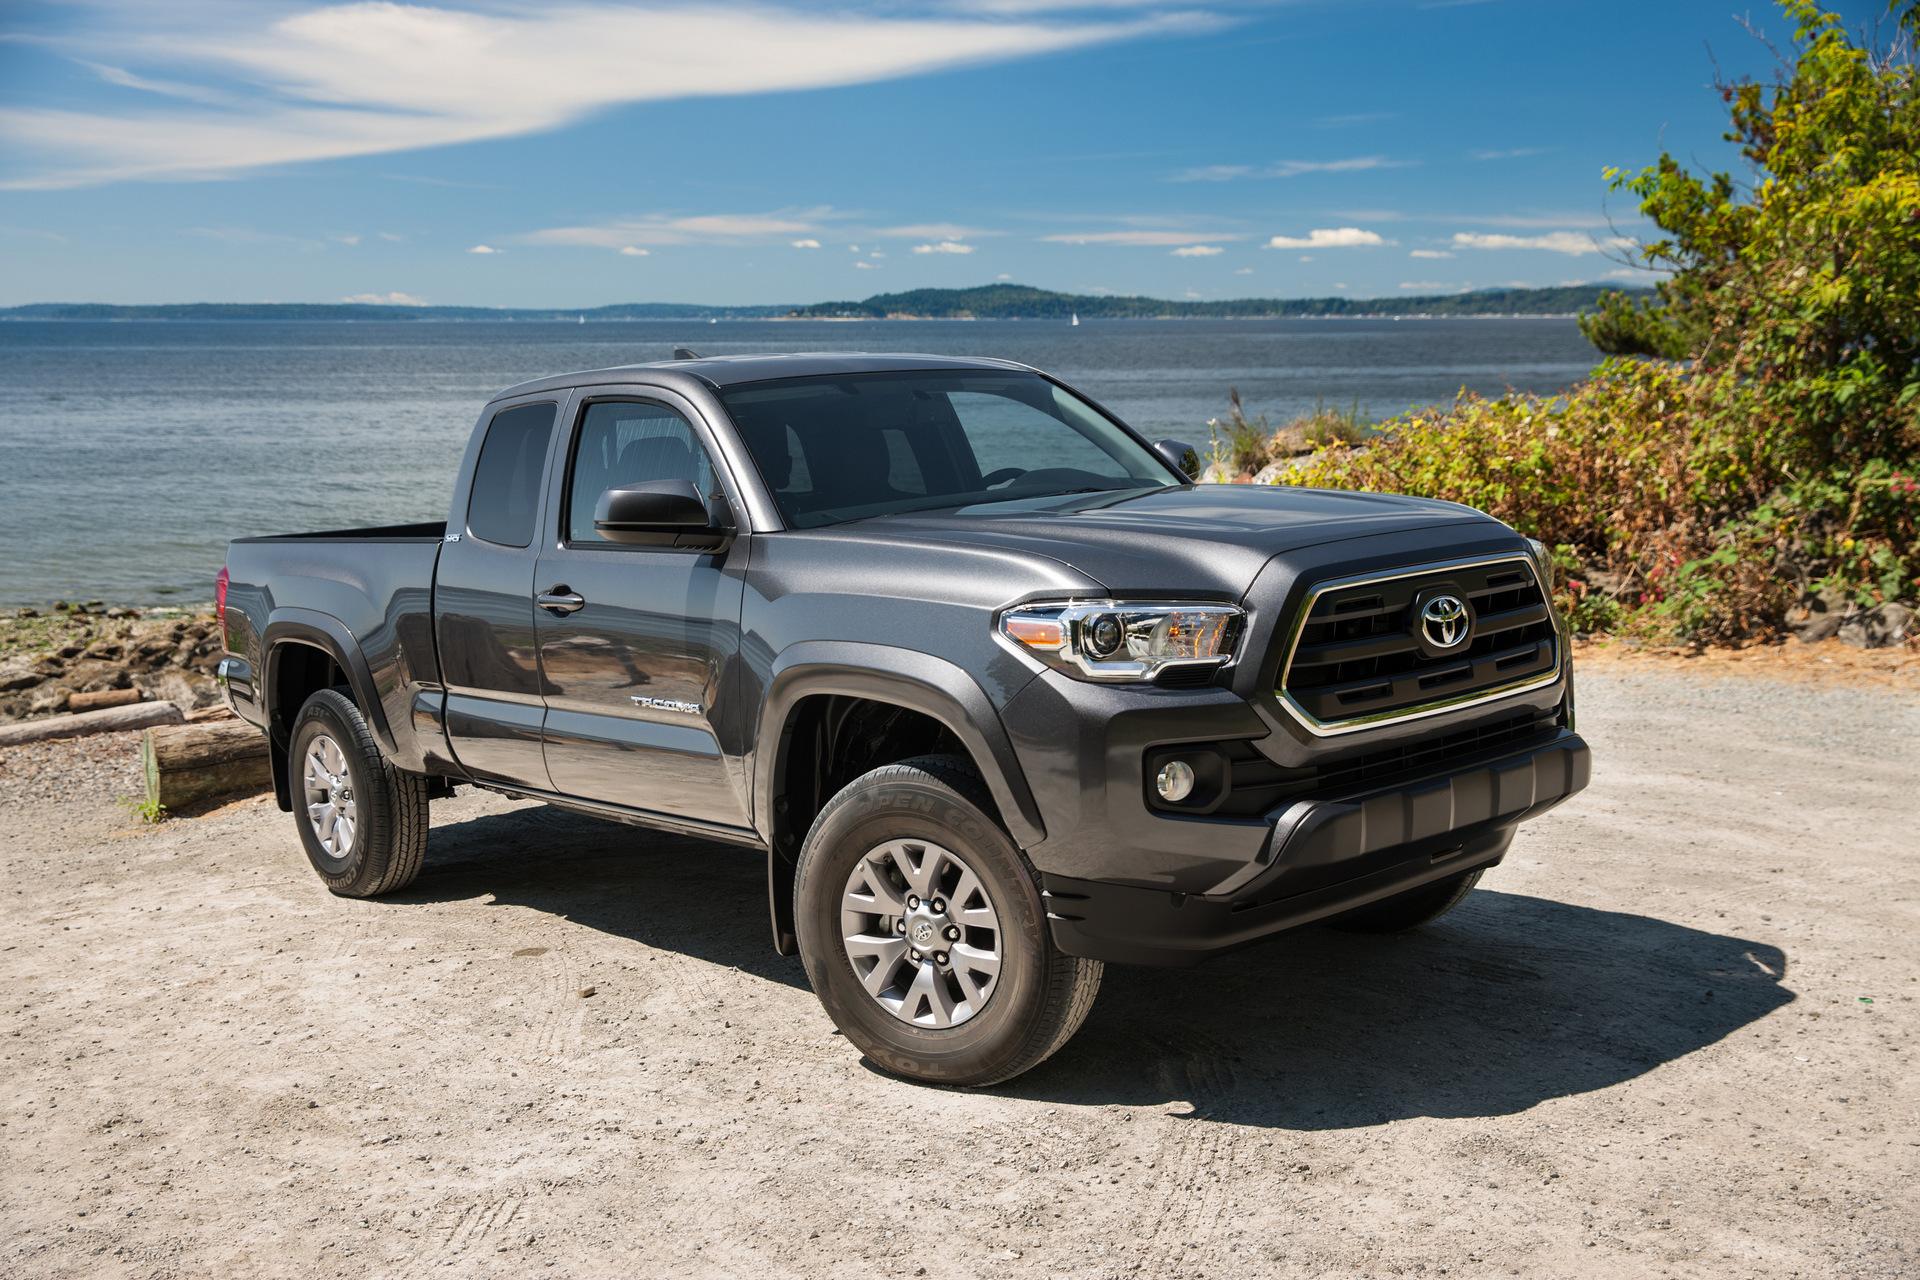 2016 Toyota Tacoma © Toyota Motor Corporation